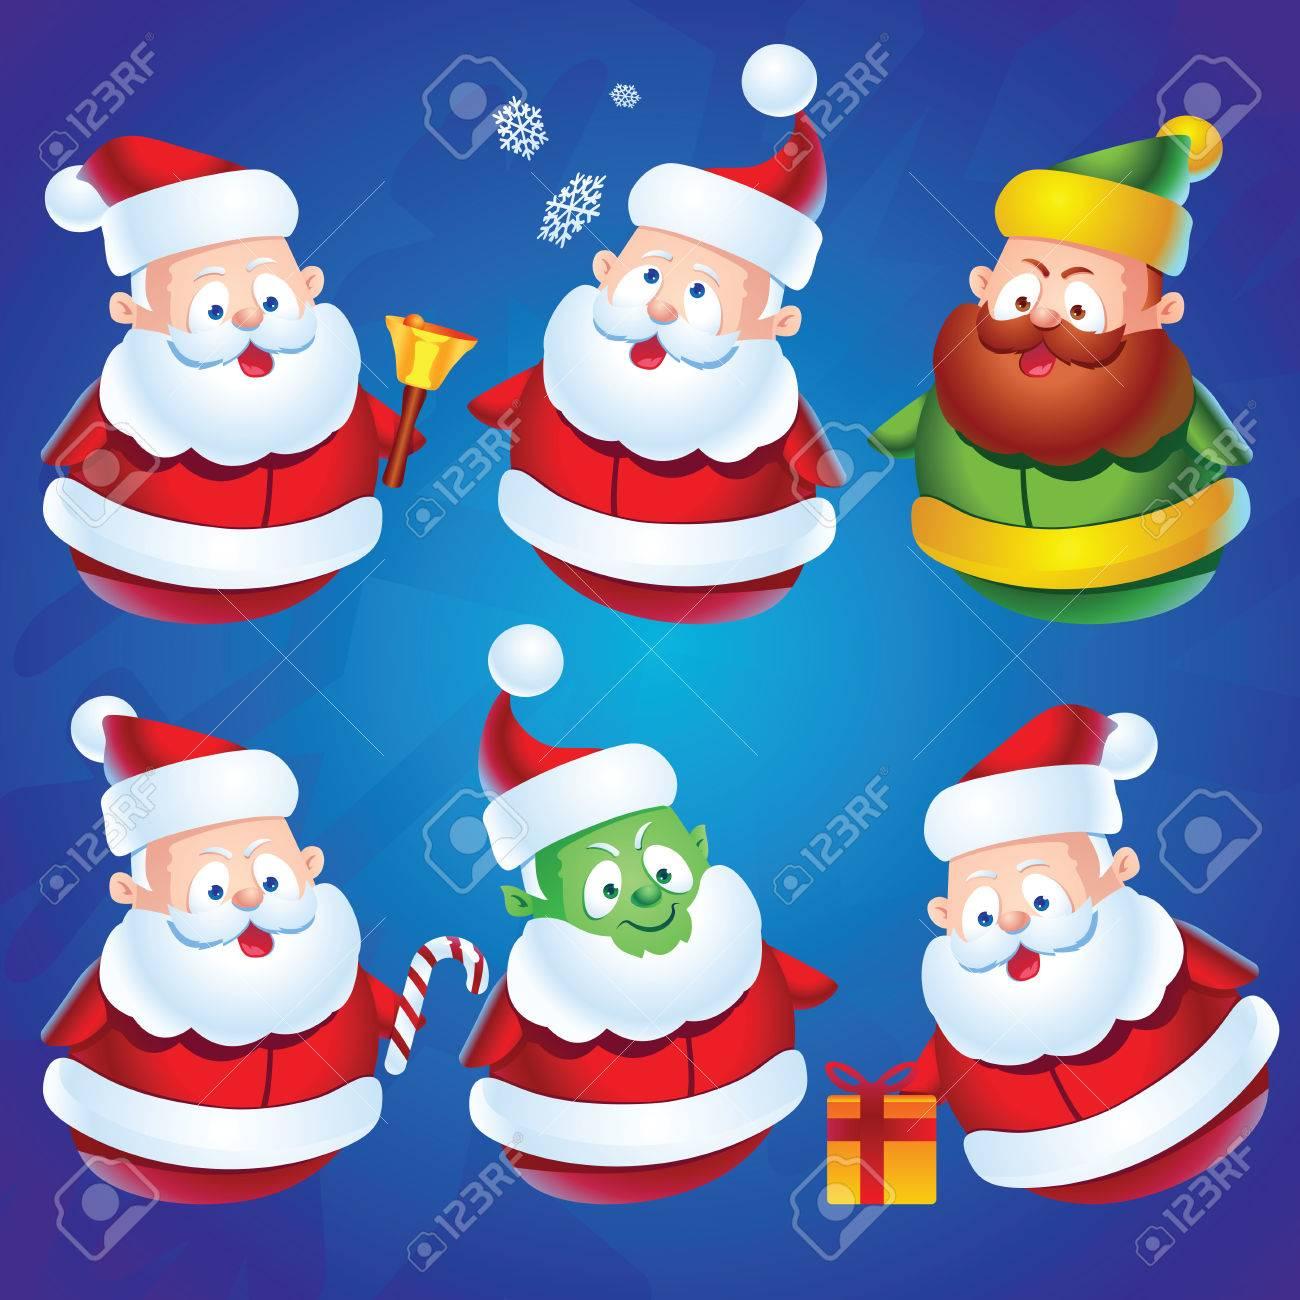 Dibujos Animados Lindo Personajes De Santa Claus Establecidos Para